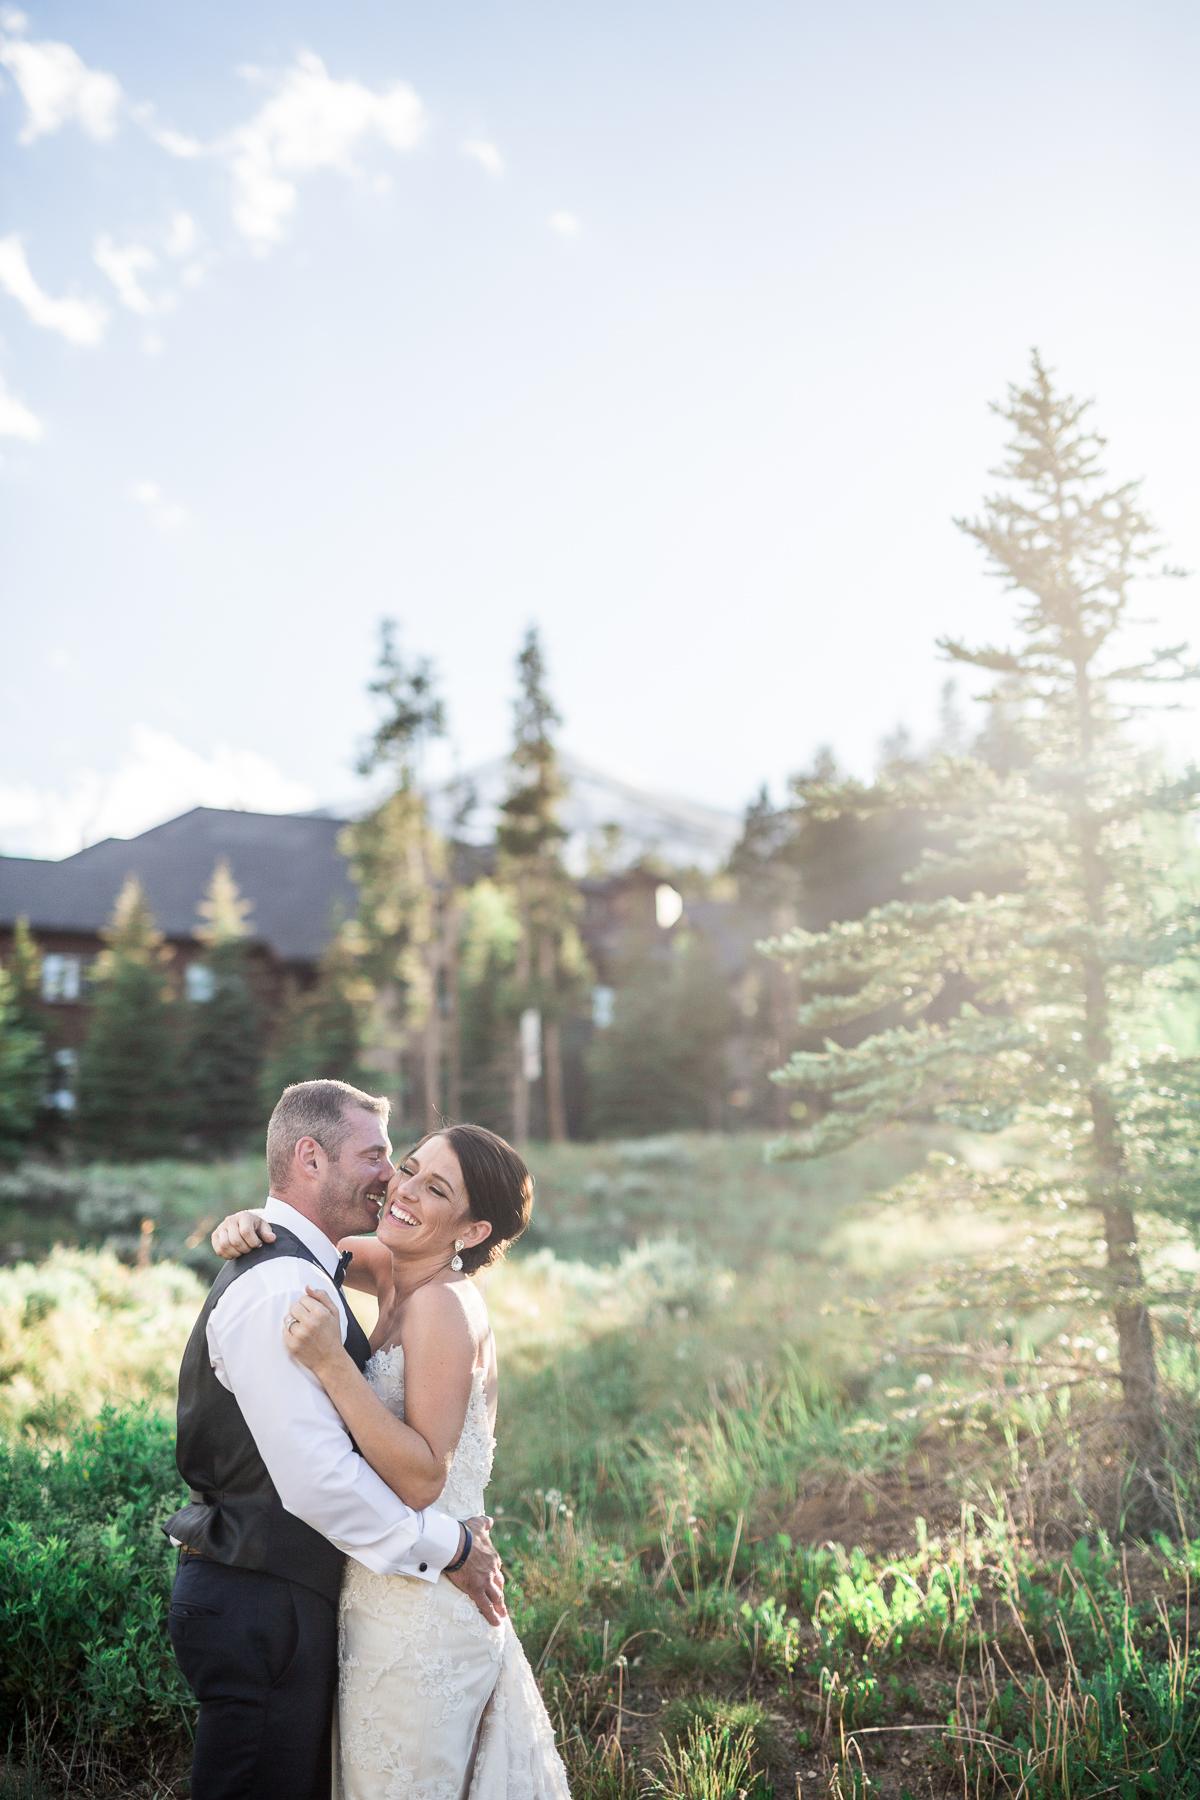 StaciDesign-Colorado-Wedding-5533.jpg